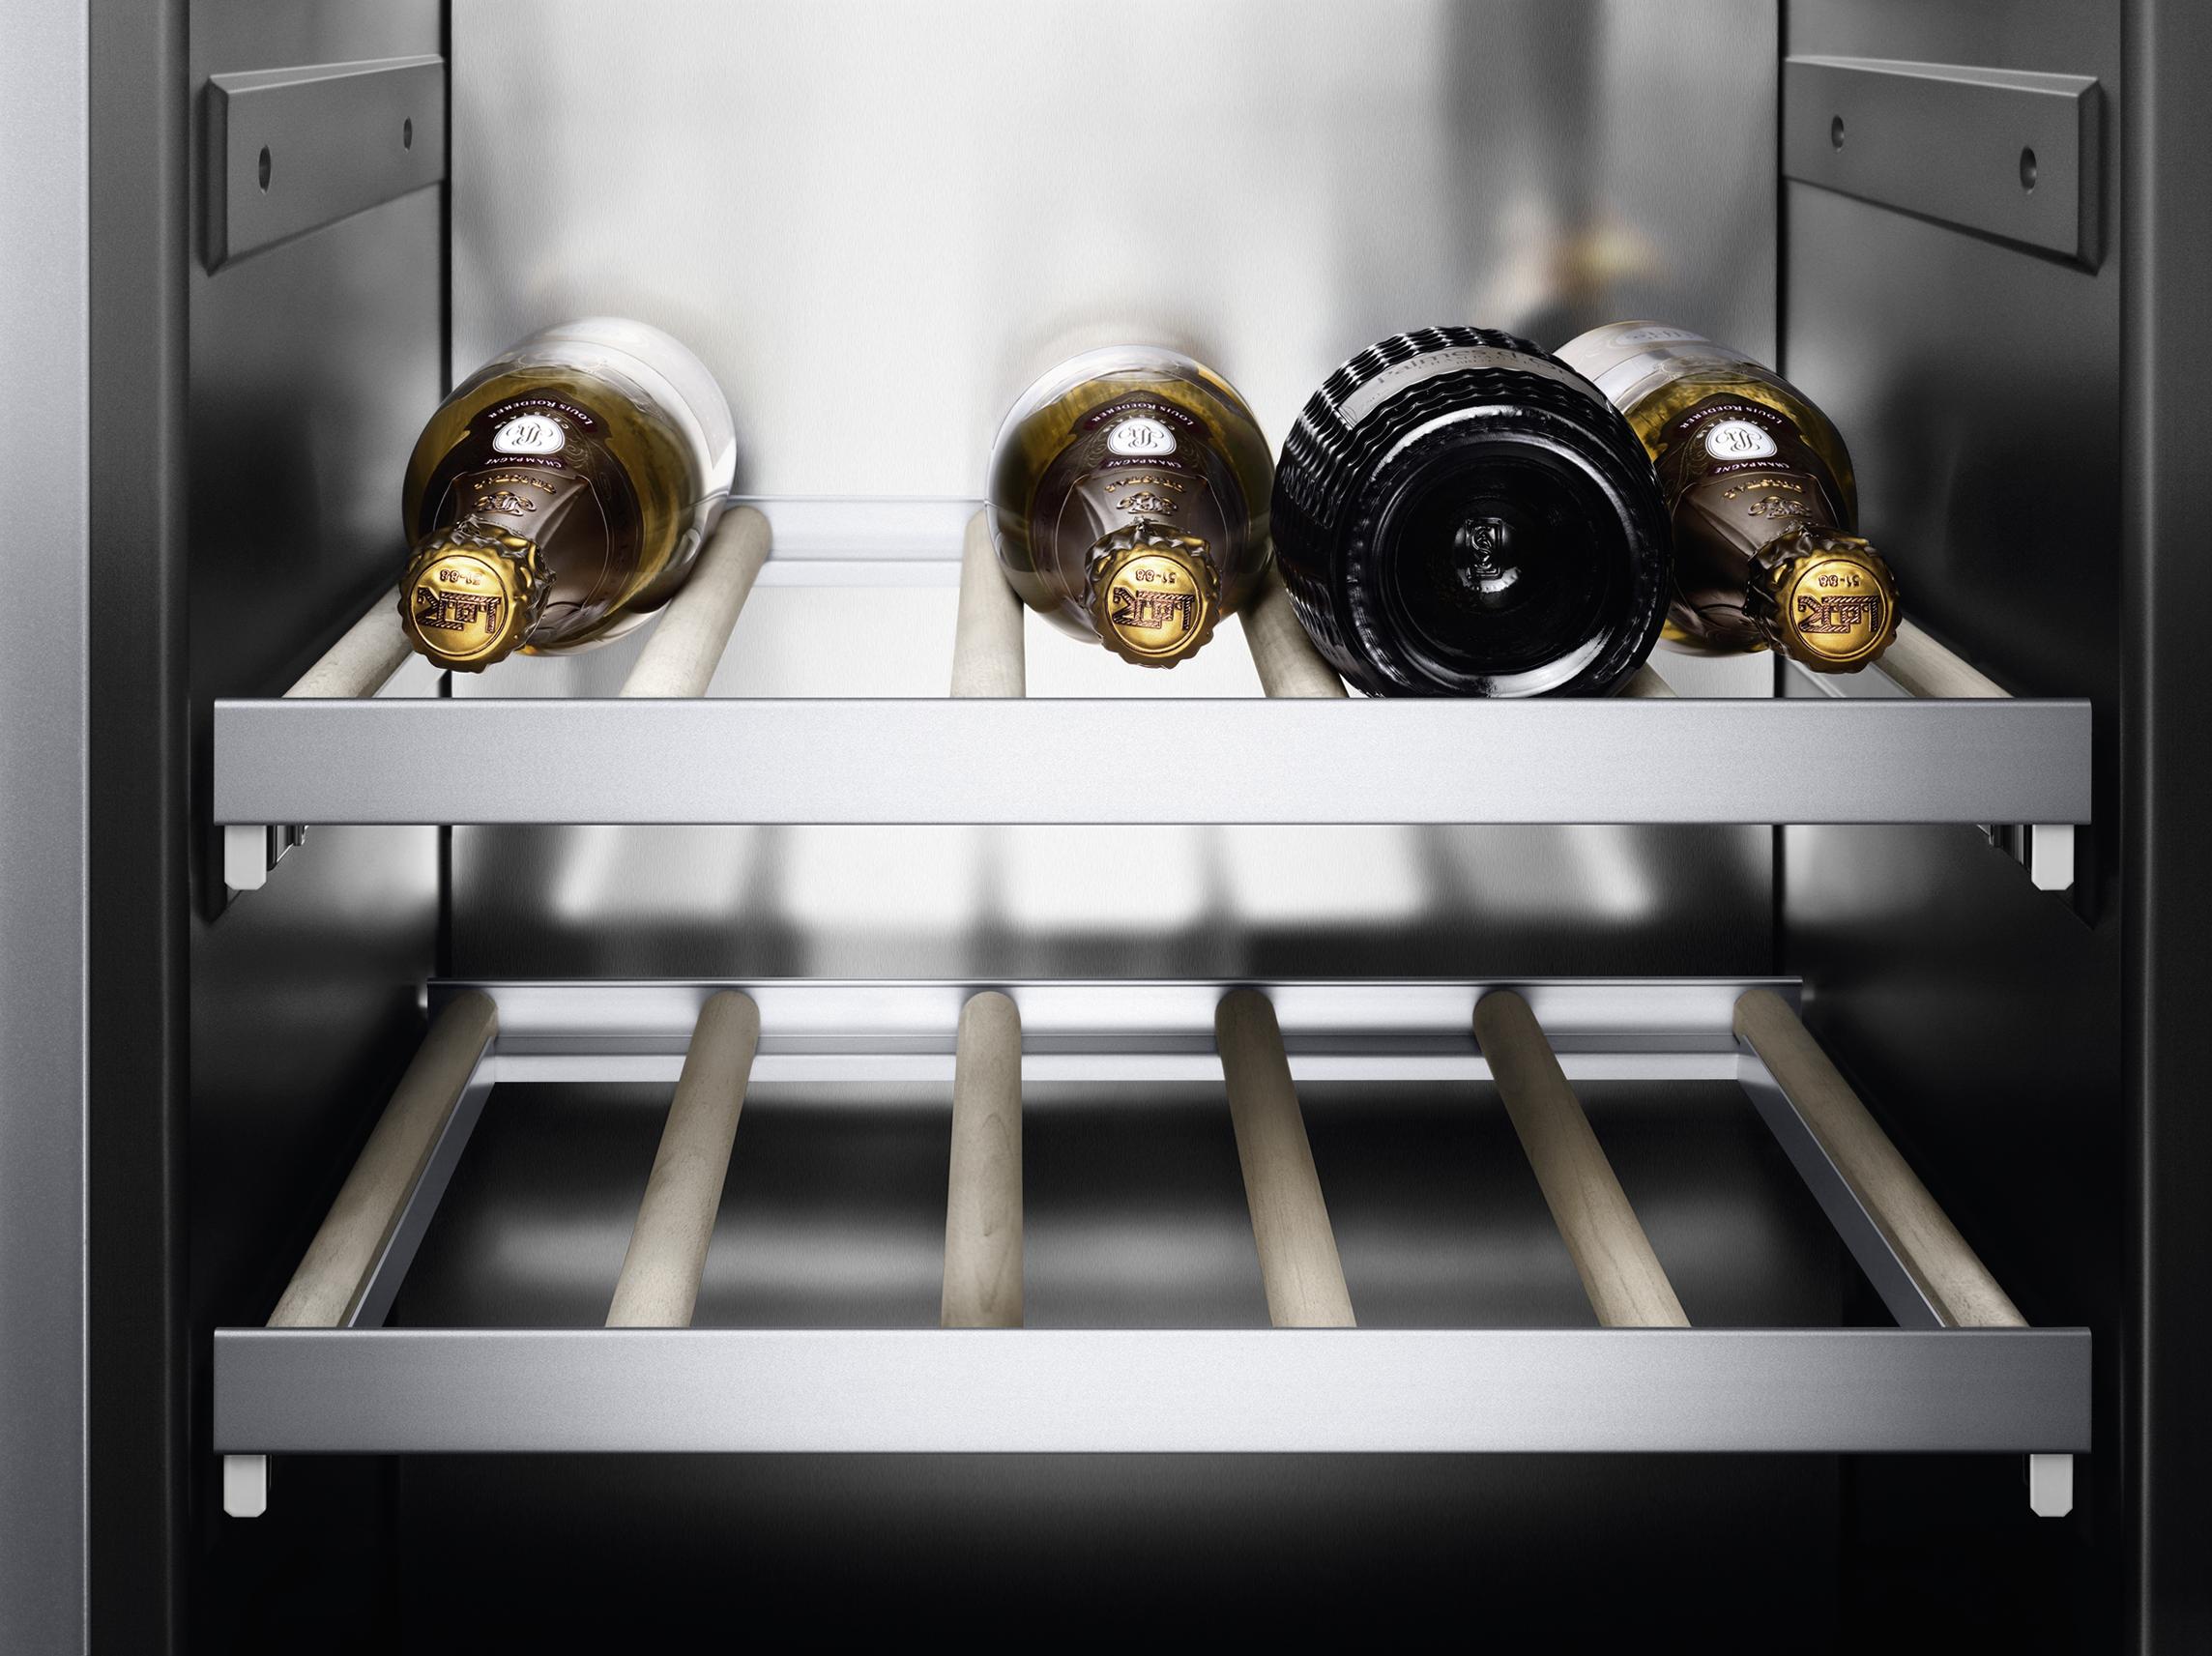 Amerikanischer Kühlschrank Wiki : Kühlschrank technikguide k o c h d u n s t